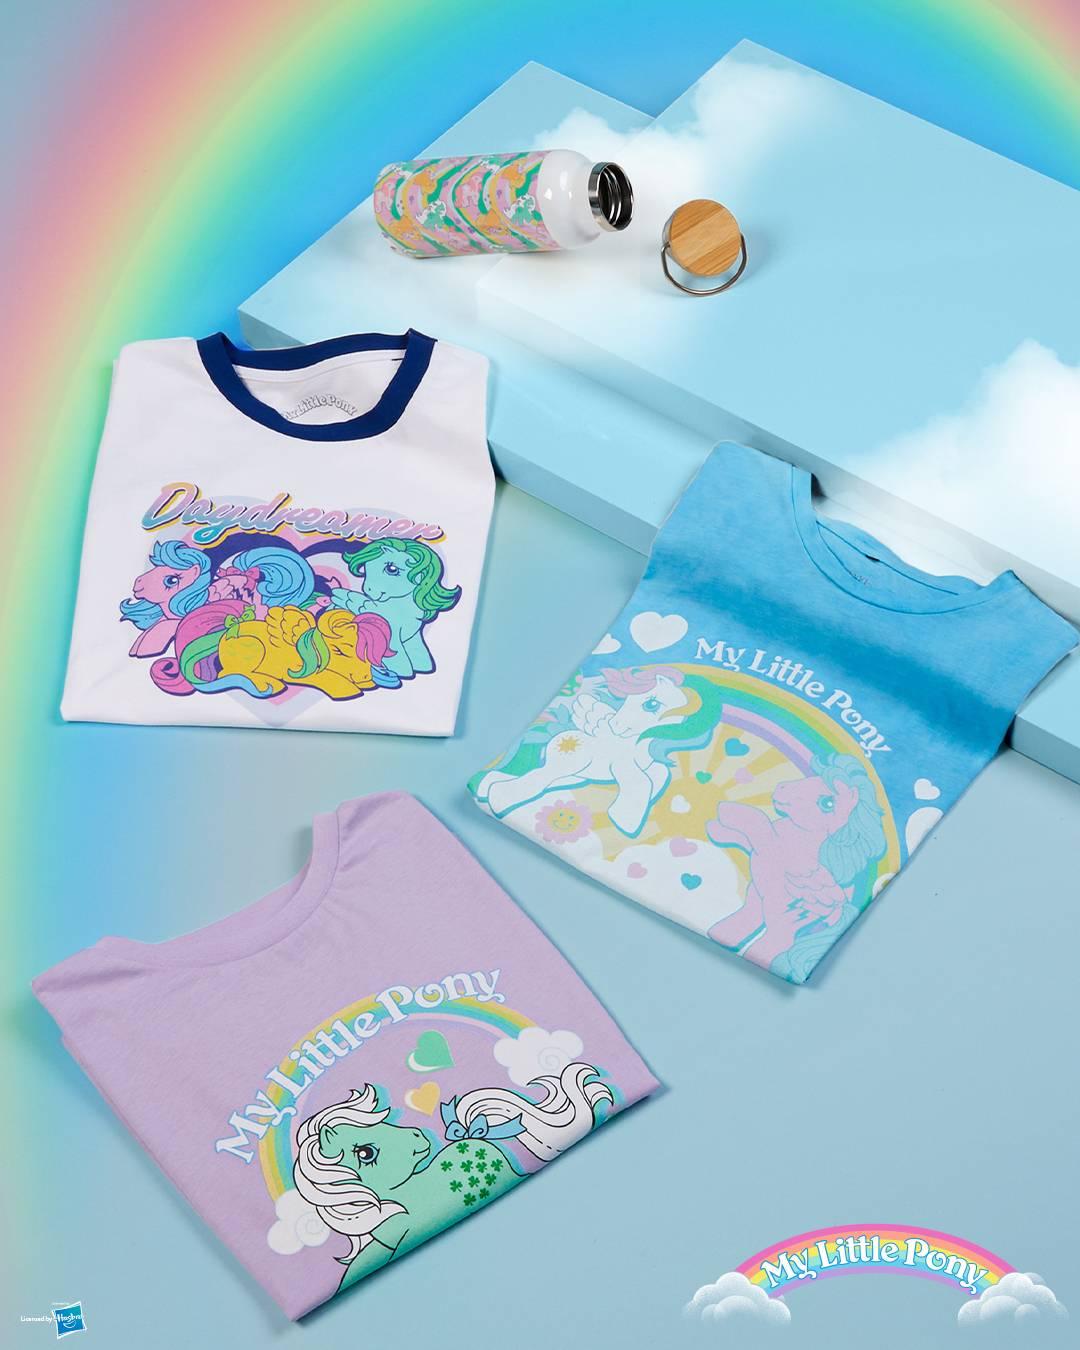 My Little Pony collection on VeryNeko